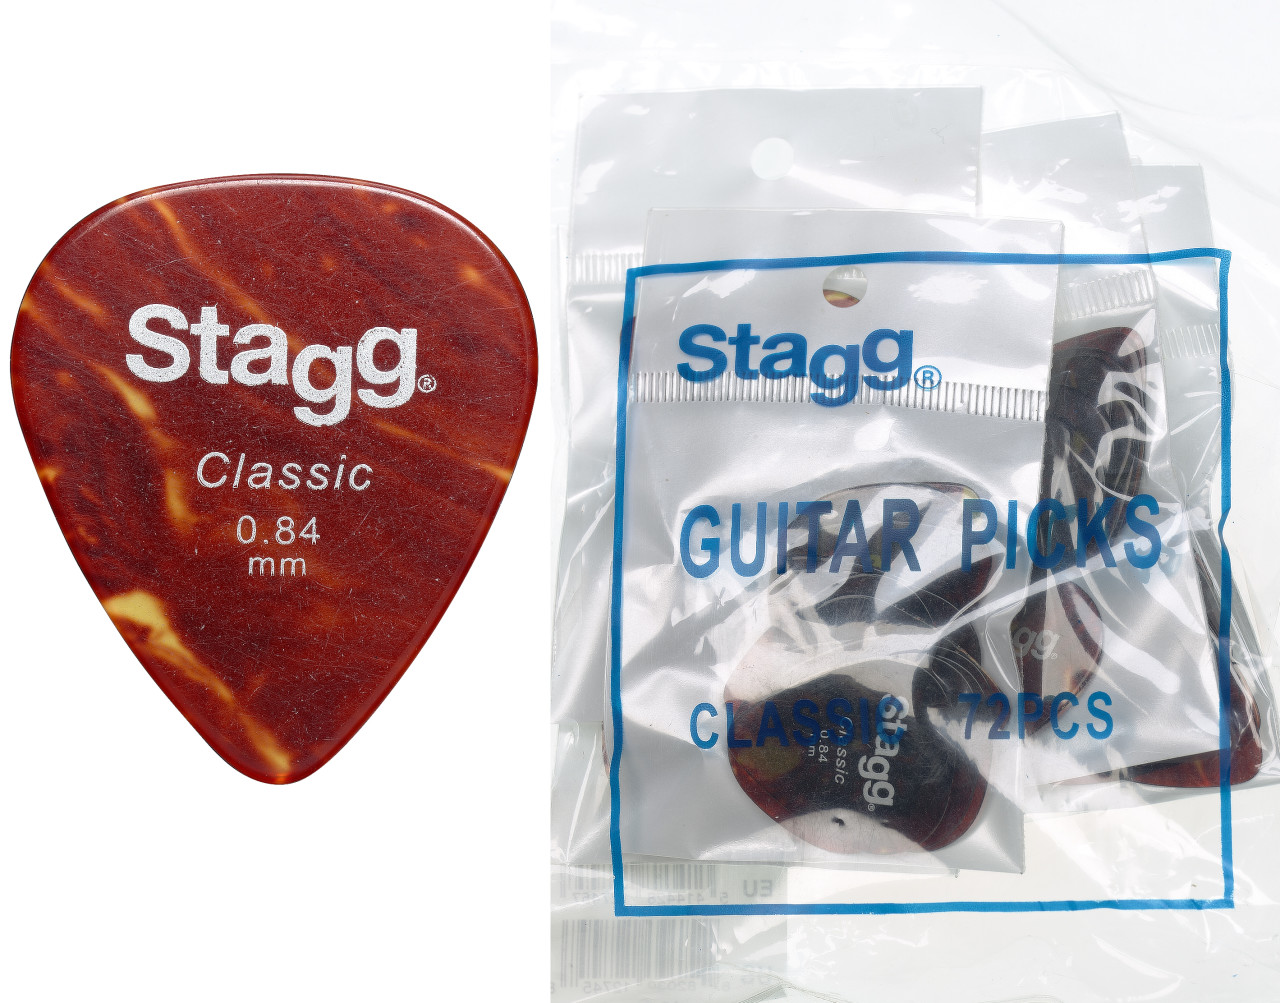 .84 mm Classic Standard Refill bag (72 picks) - Tortoiseshell